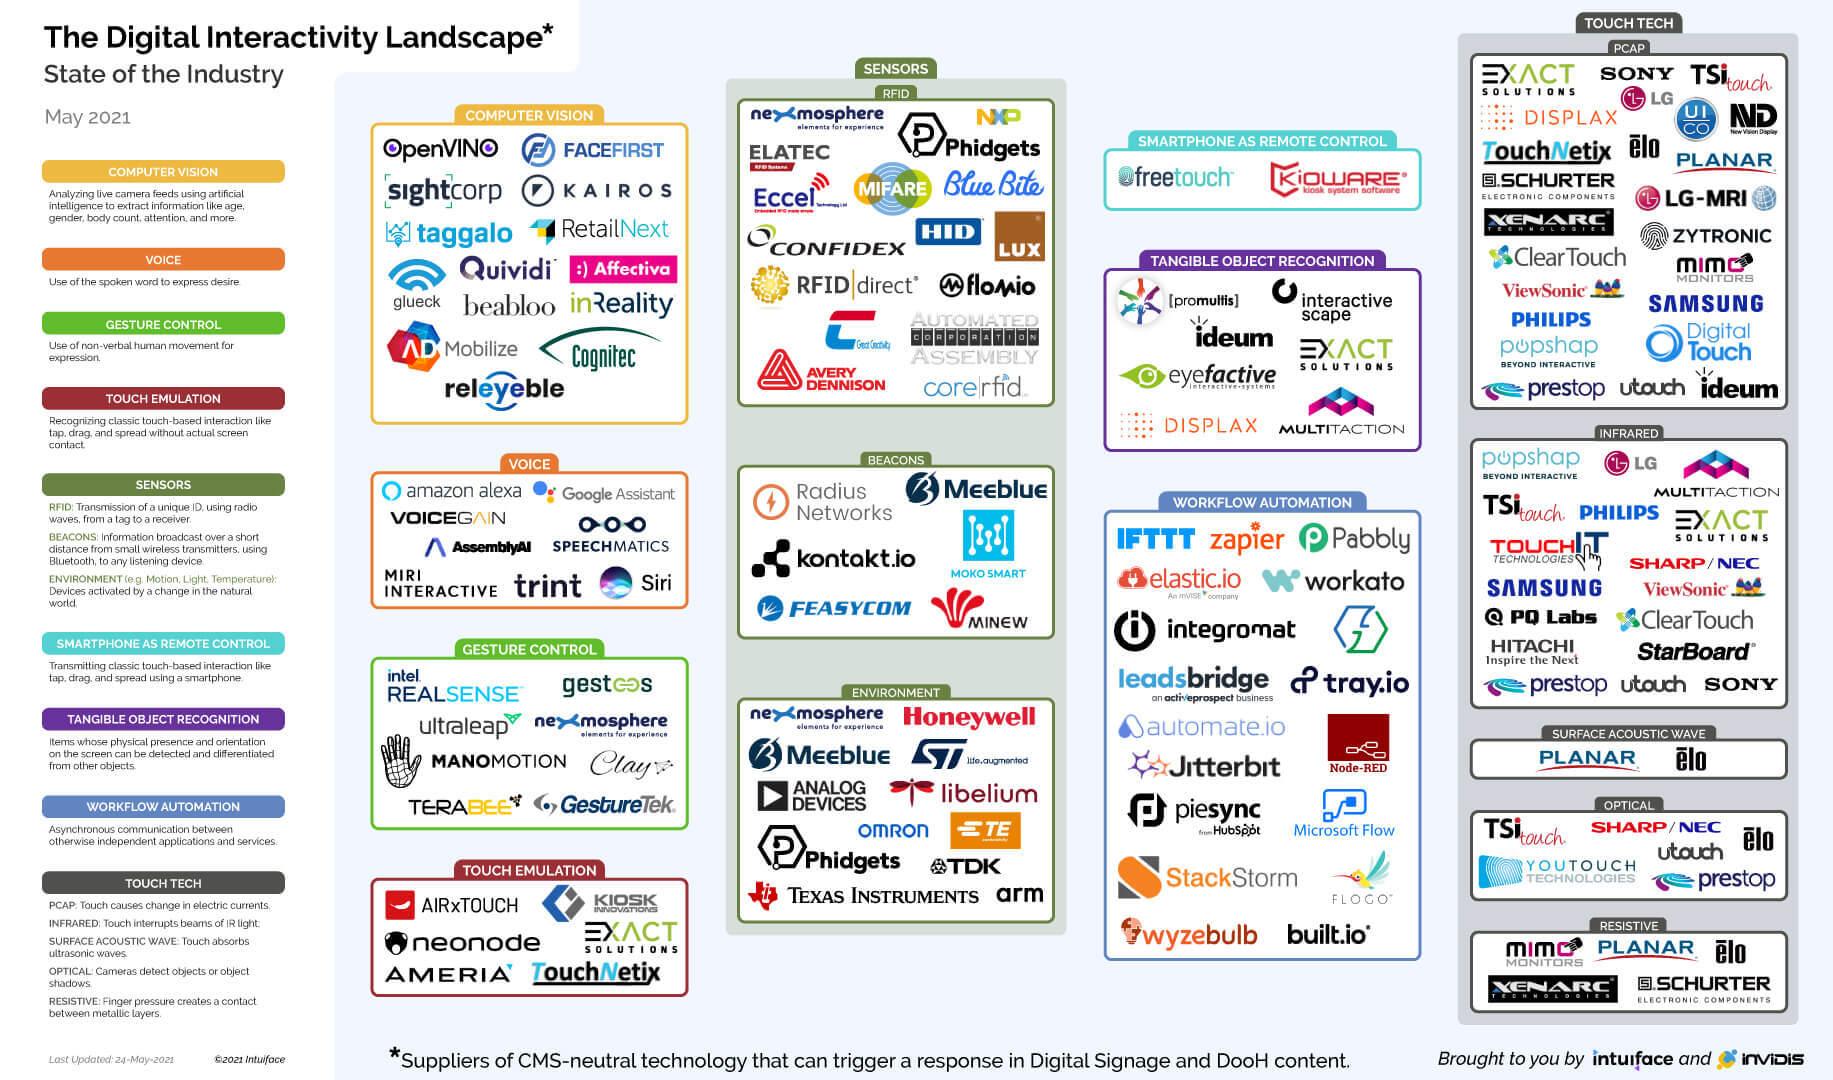 Digital Interactivity Landscape